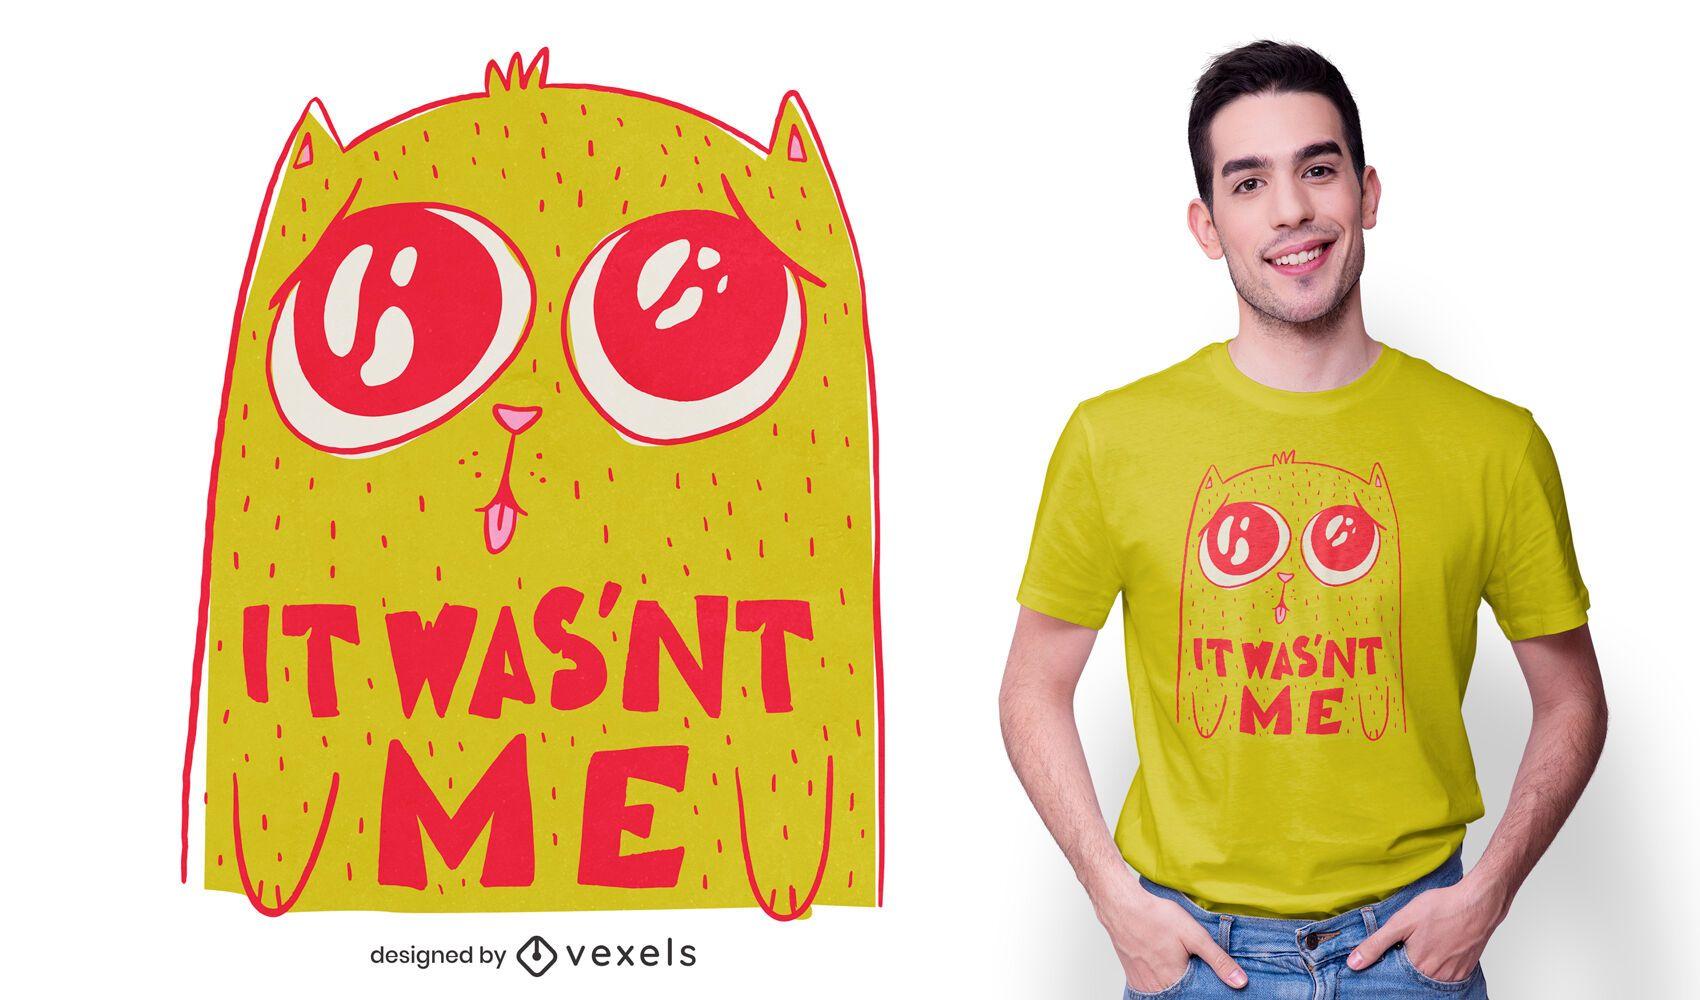 It wasn't me t-shirt design